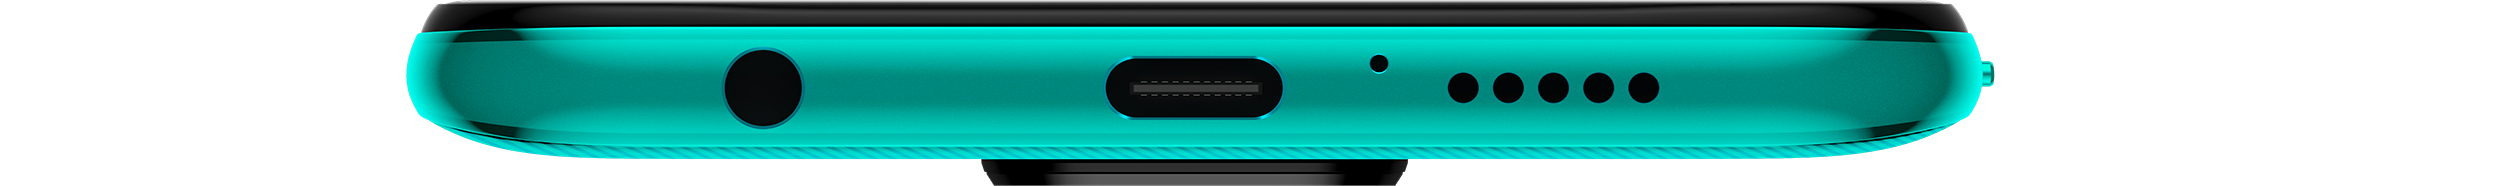 Redmi Note 9 Pro okostelefon (Global) - 6+128GB, Tropical Green